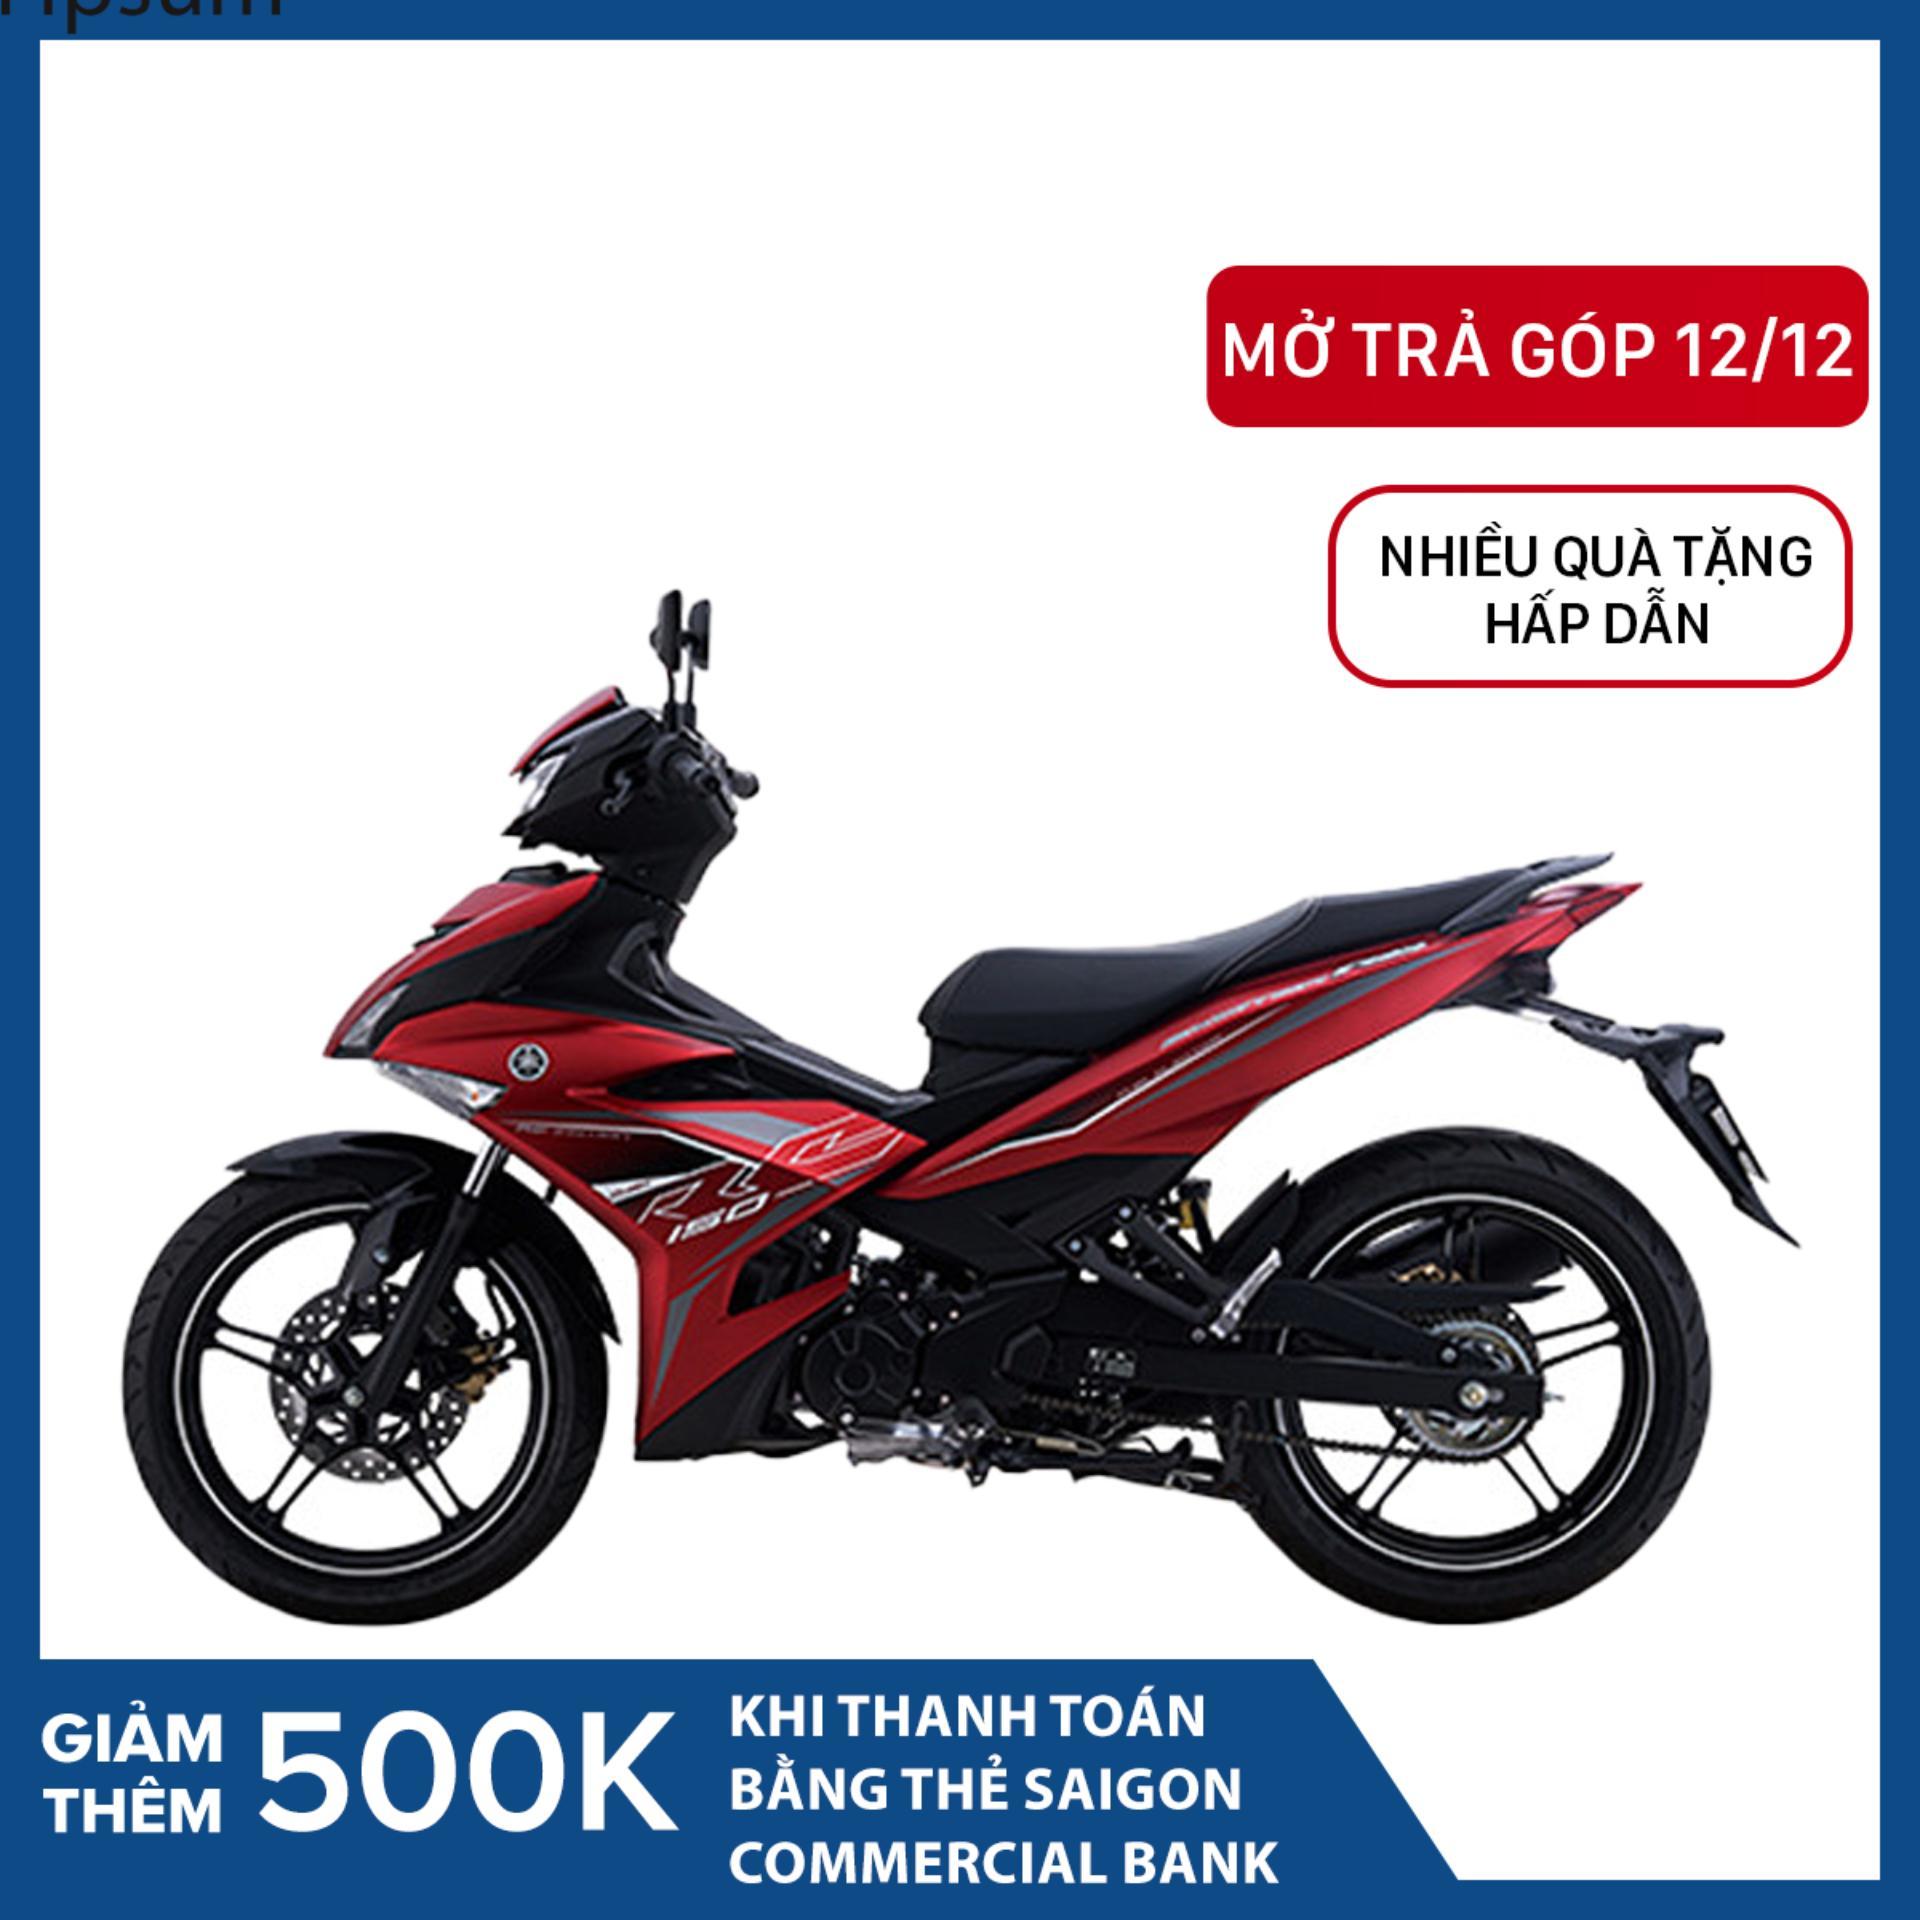 Yamaha Exciter Đỏ Nhám RC 150cc 2019